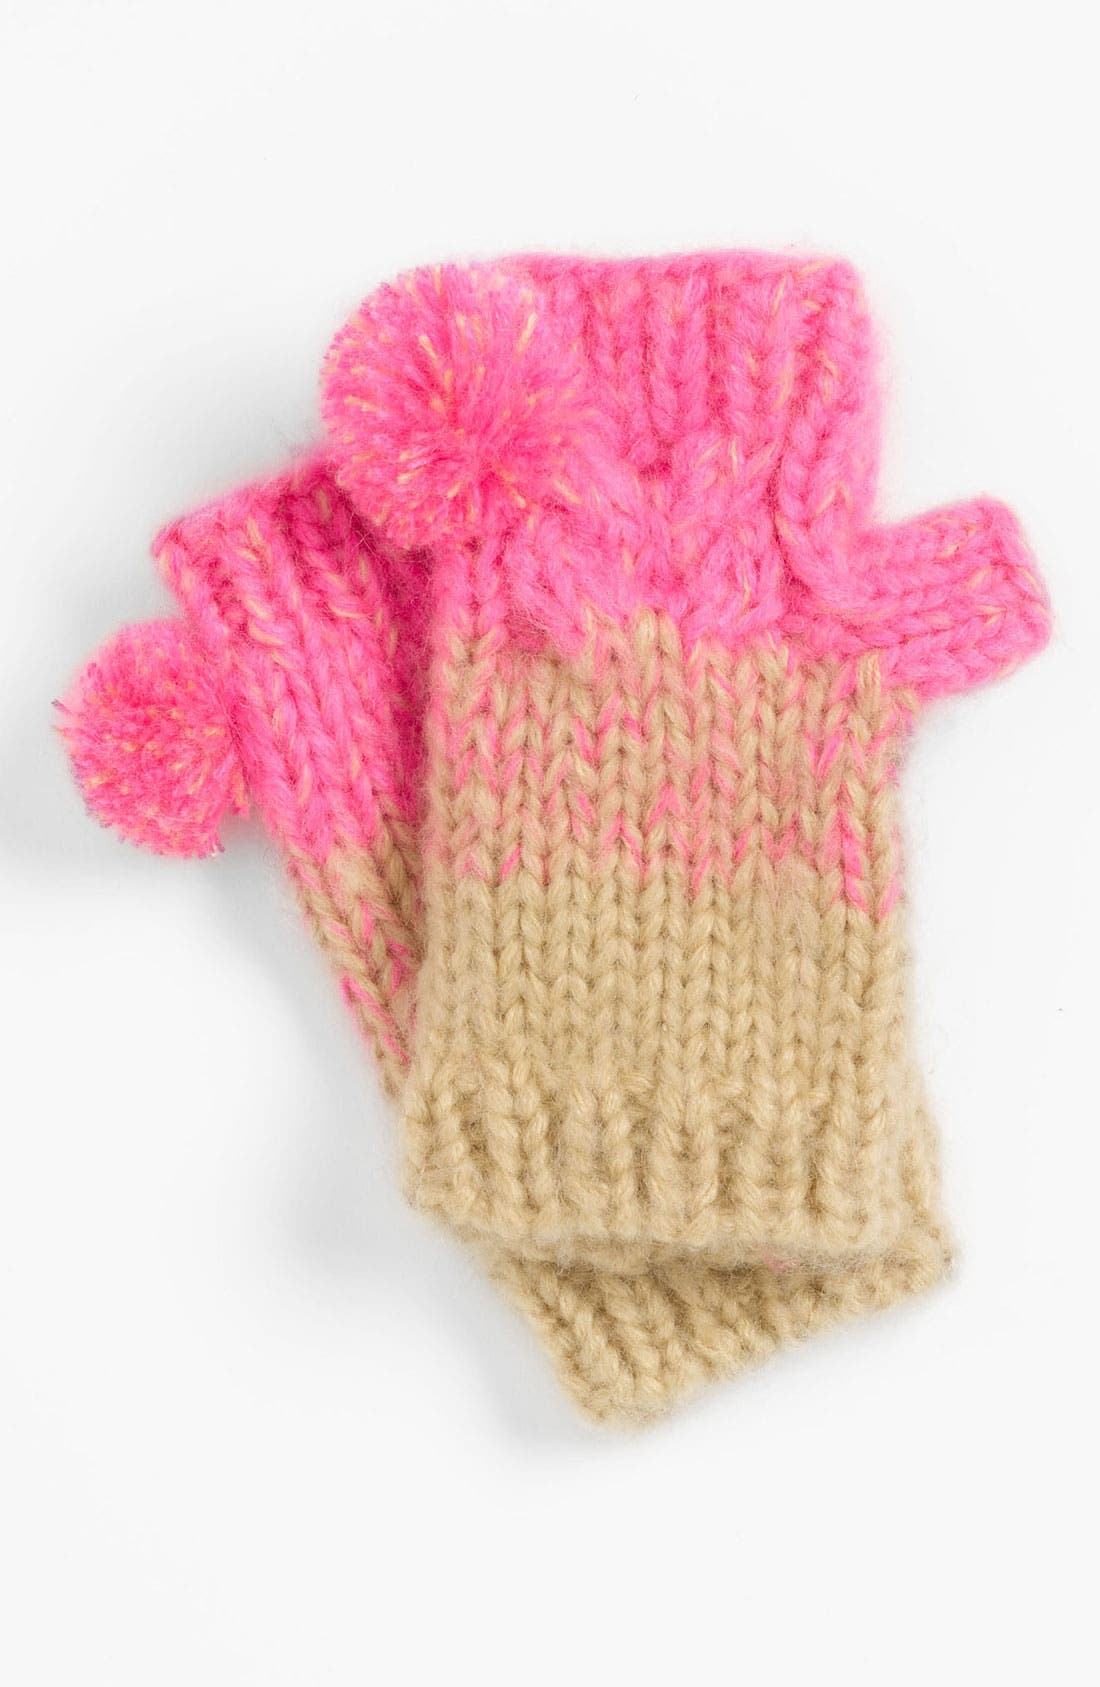 Alternate Image 1 Selected - Peace of Cake 'Pigtail' Fingerless Gloves (Girls)